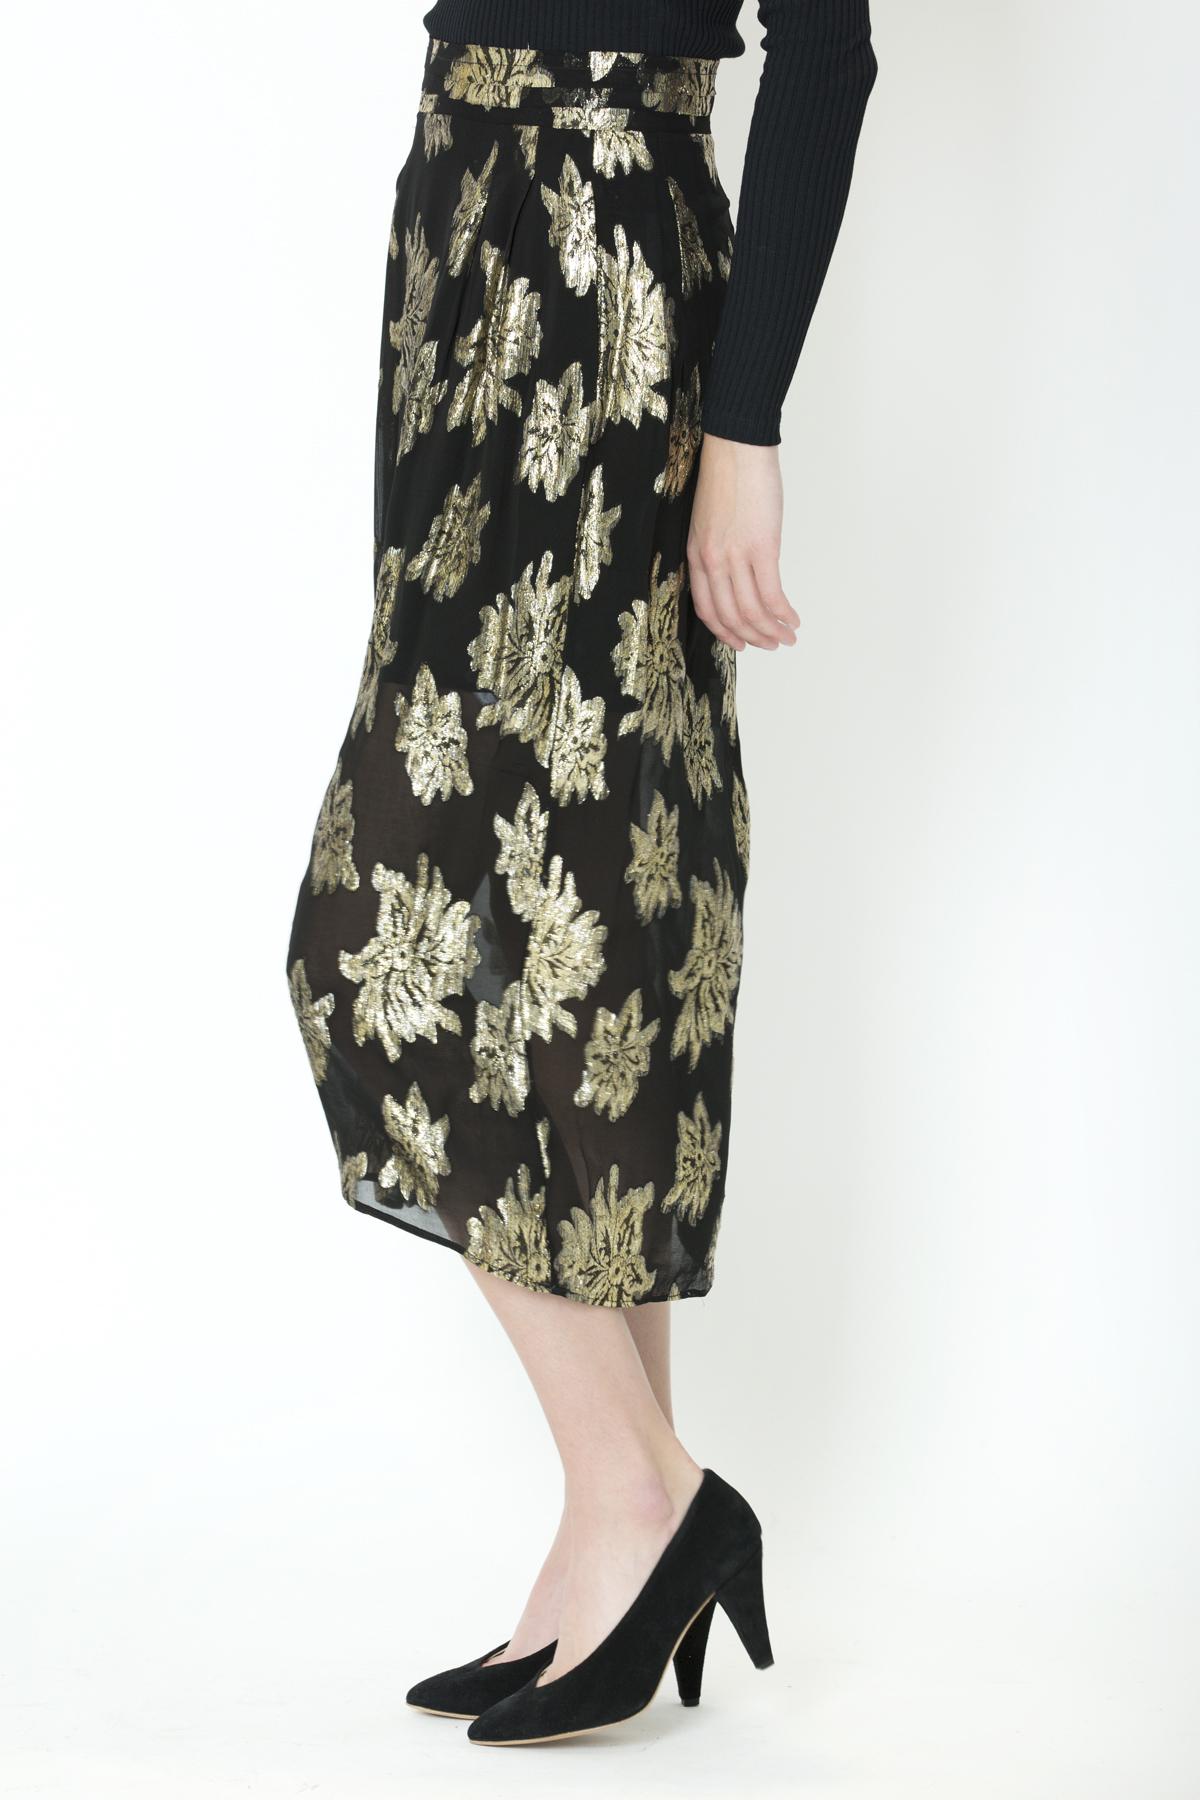 braina-skirt-highwaist-black-gold-floral-viscose-iro-matchboxathens